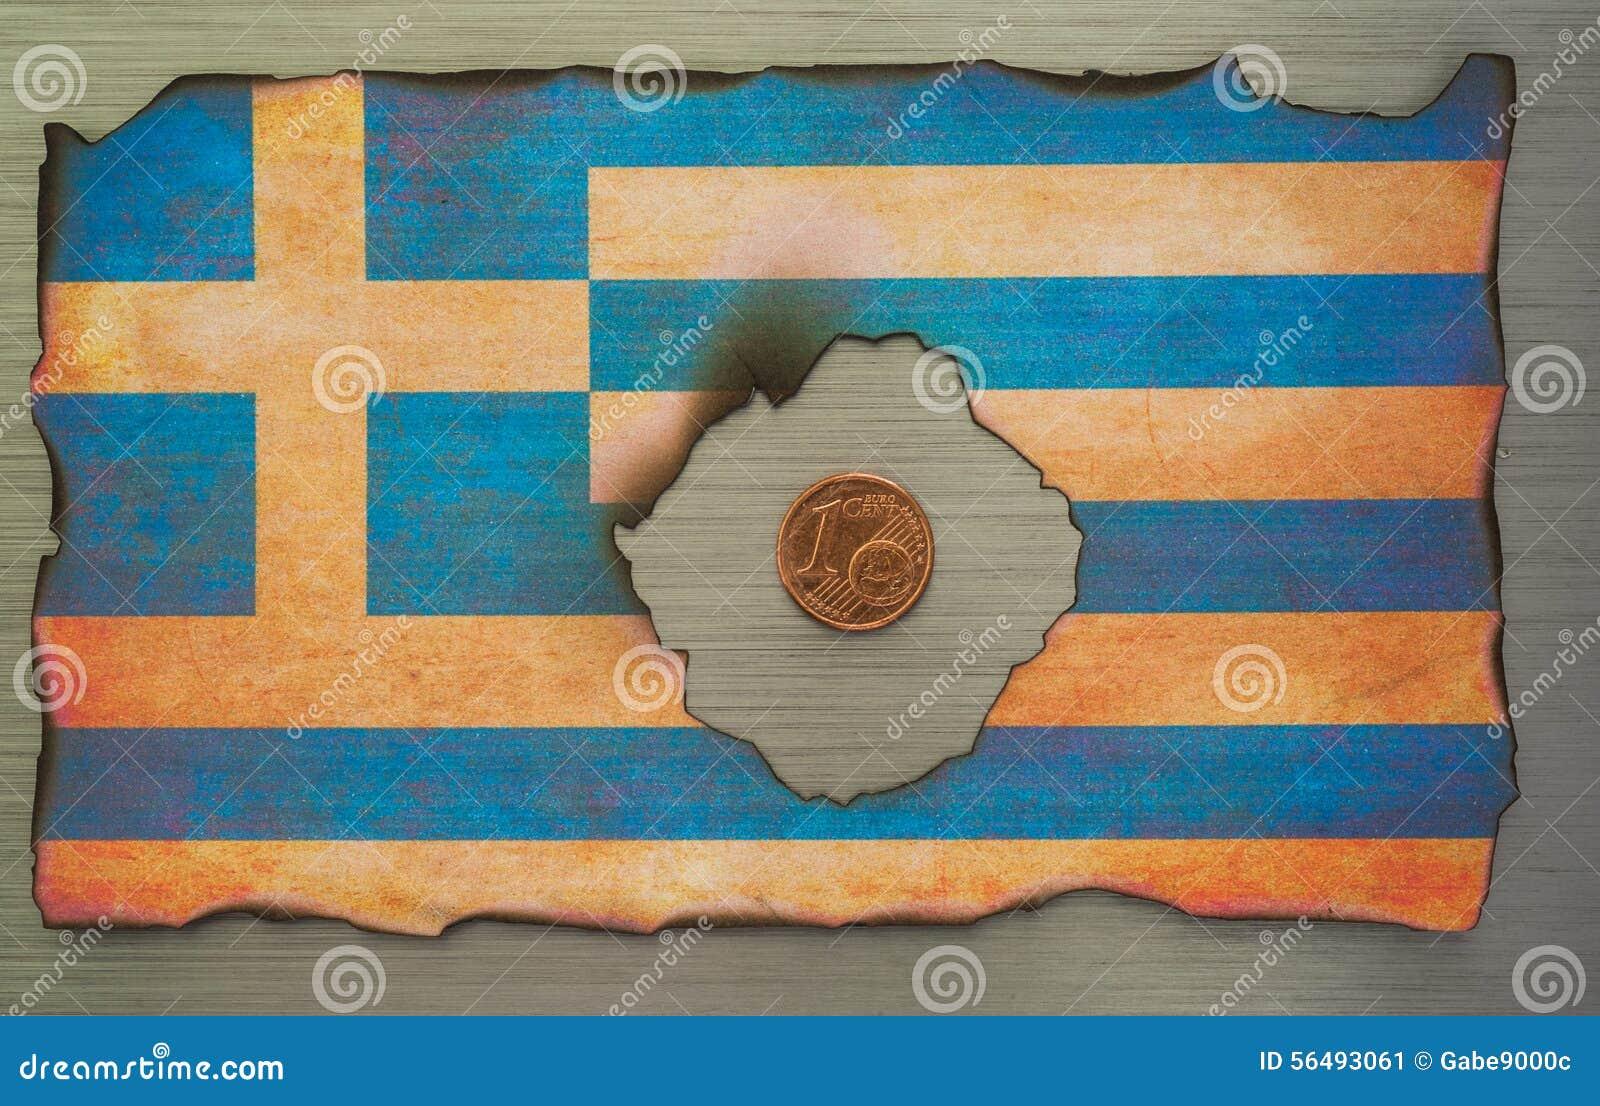 Bandeira grega sumário escovado do metal